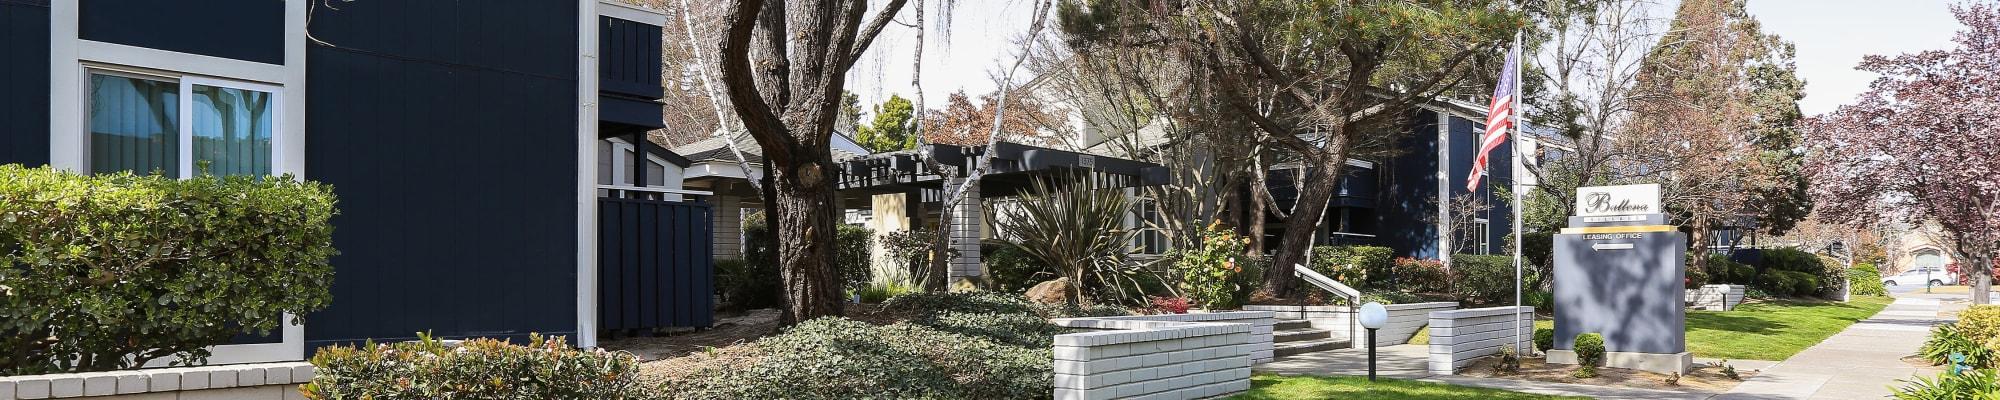 Resident perks at Ballena Village Apartment Homes in Alameda, California